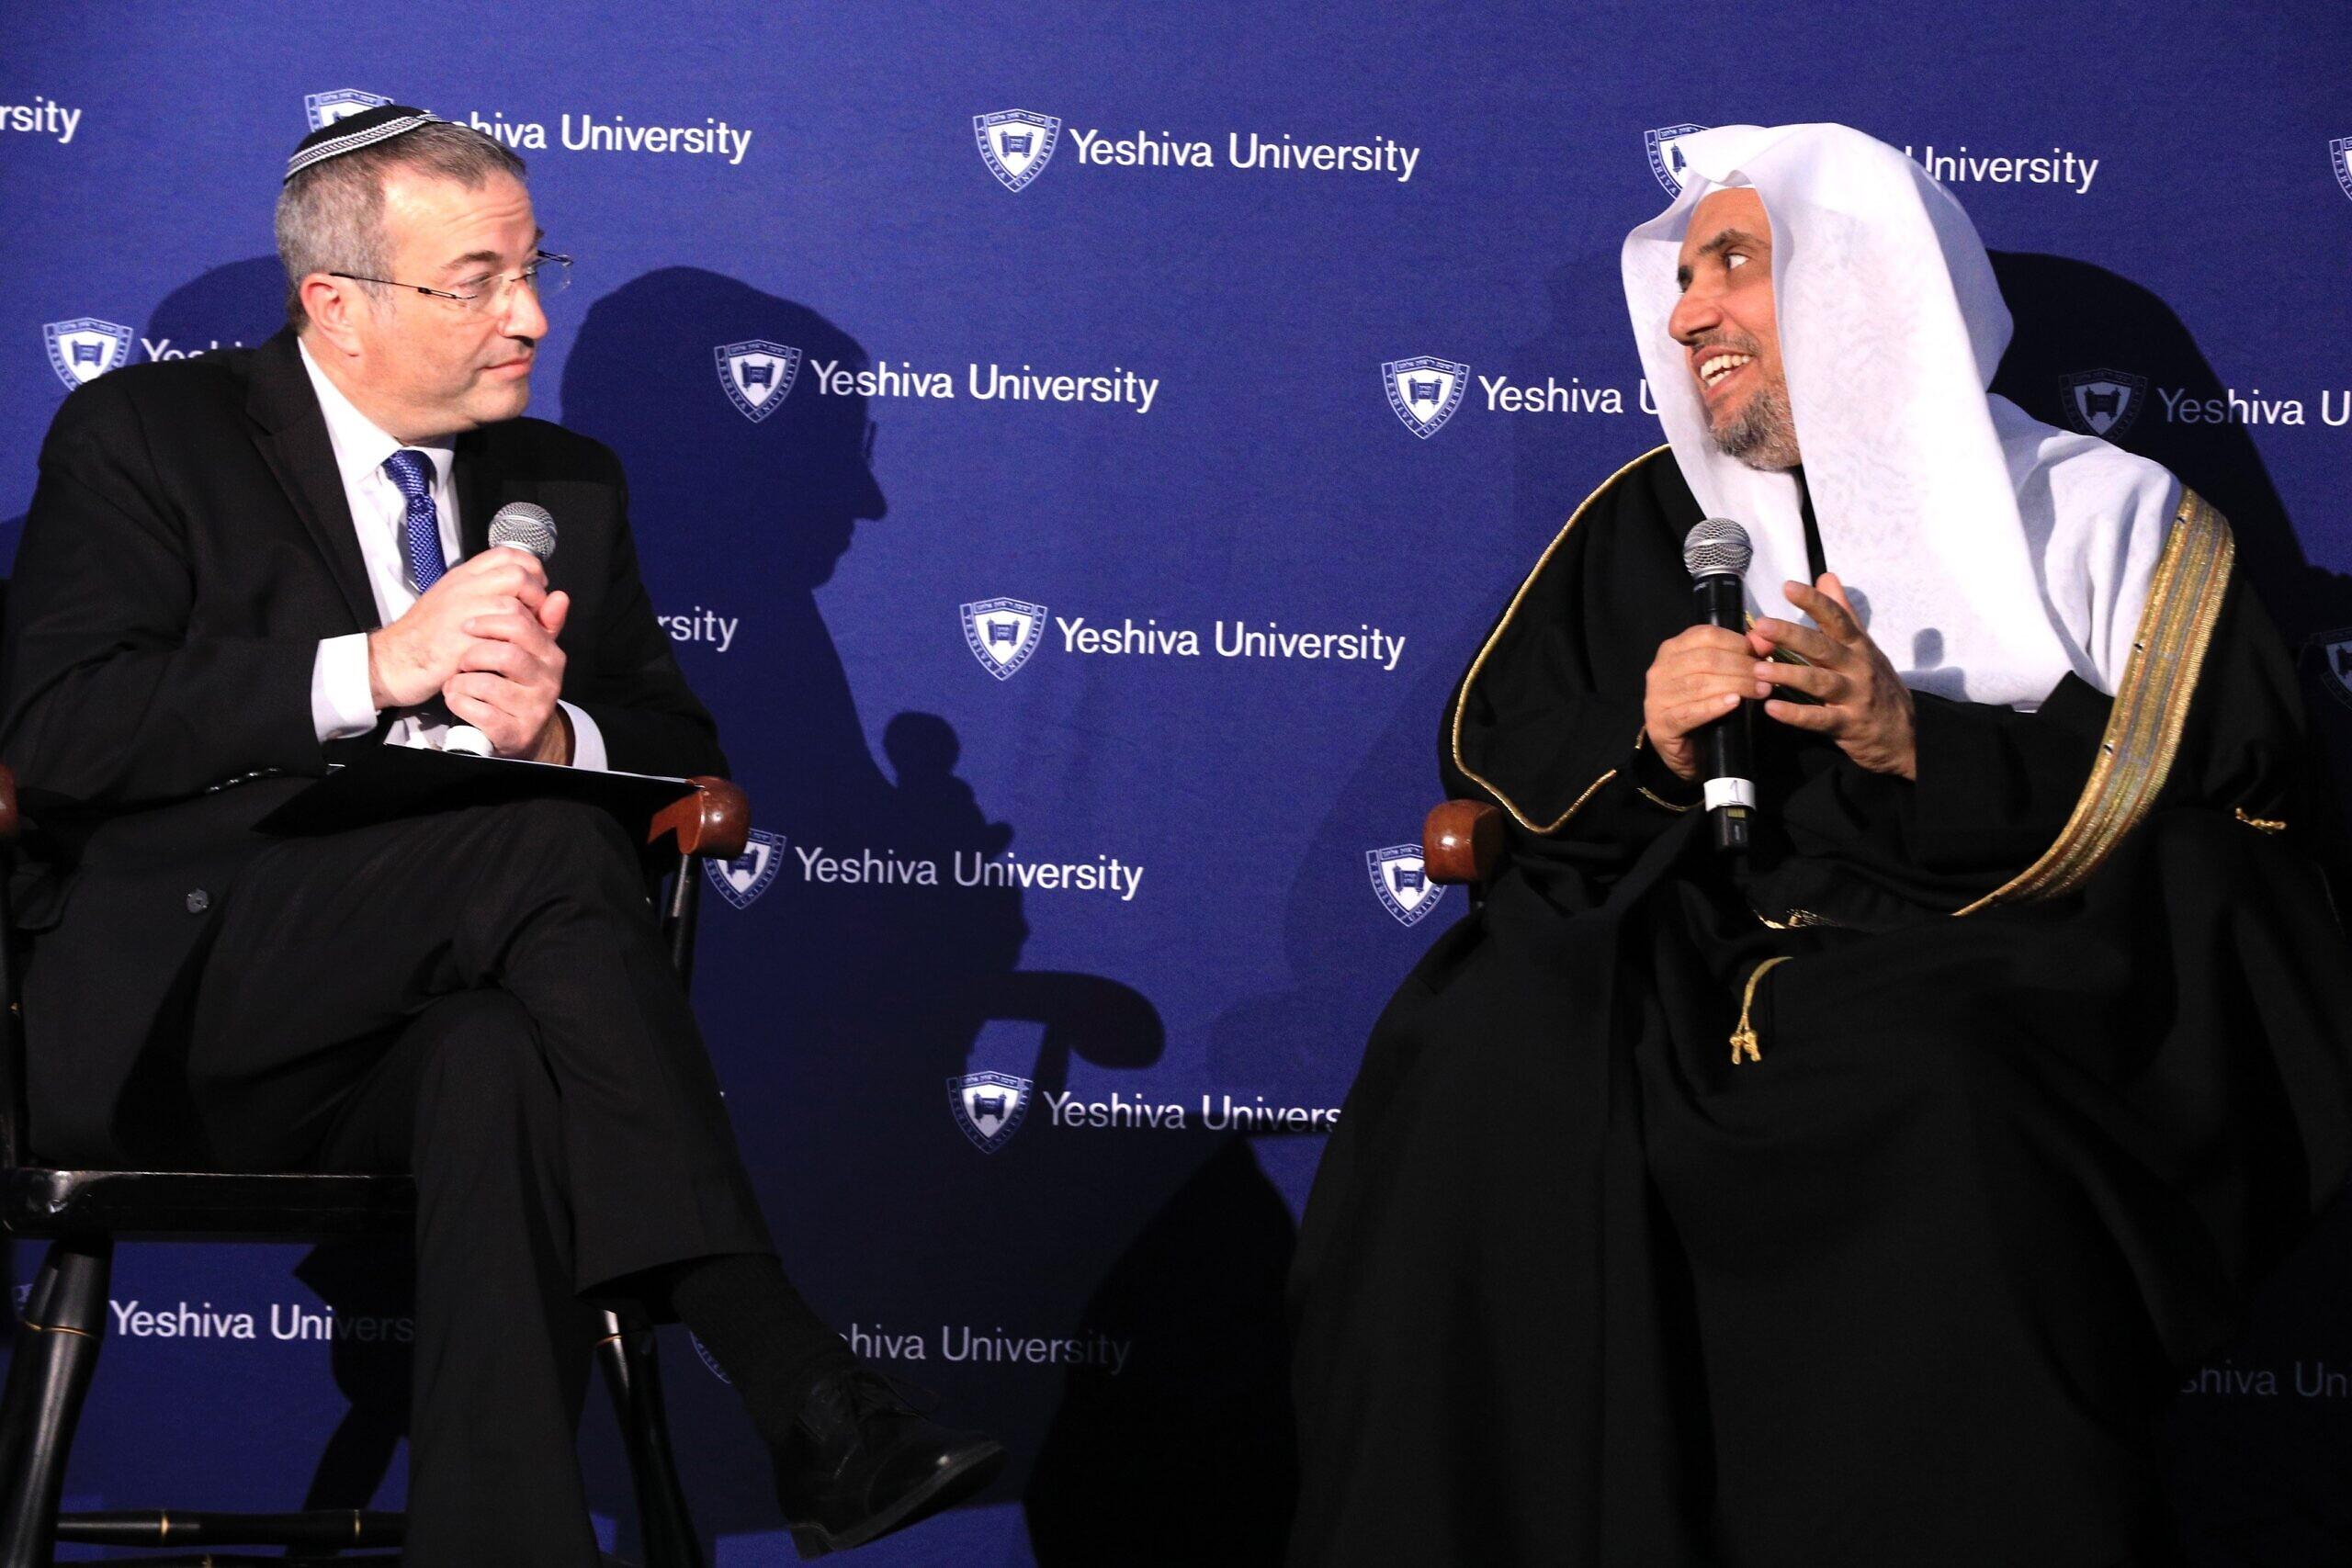 Yeshiva University Welcomes Muslim World League Secretary General Sheikh Dr. Mohammad Al-Issa for Inaugural Presidential Forum Conversation